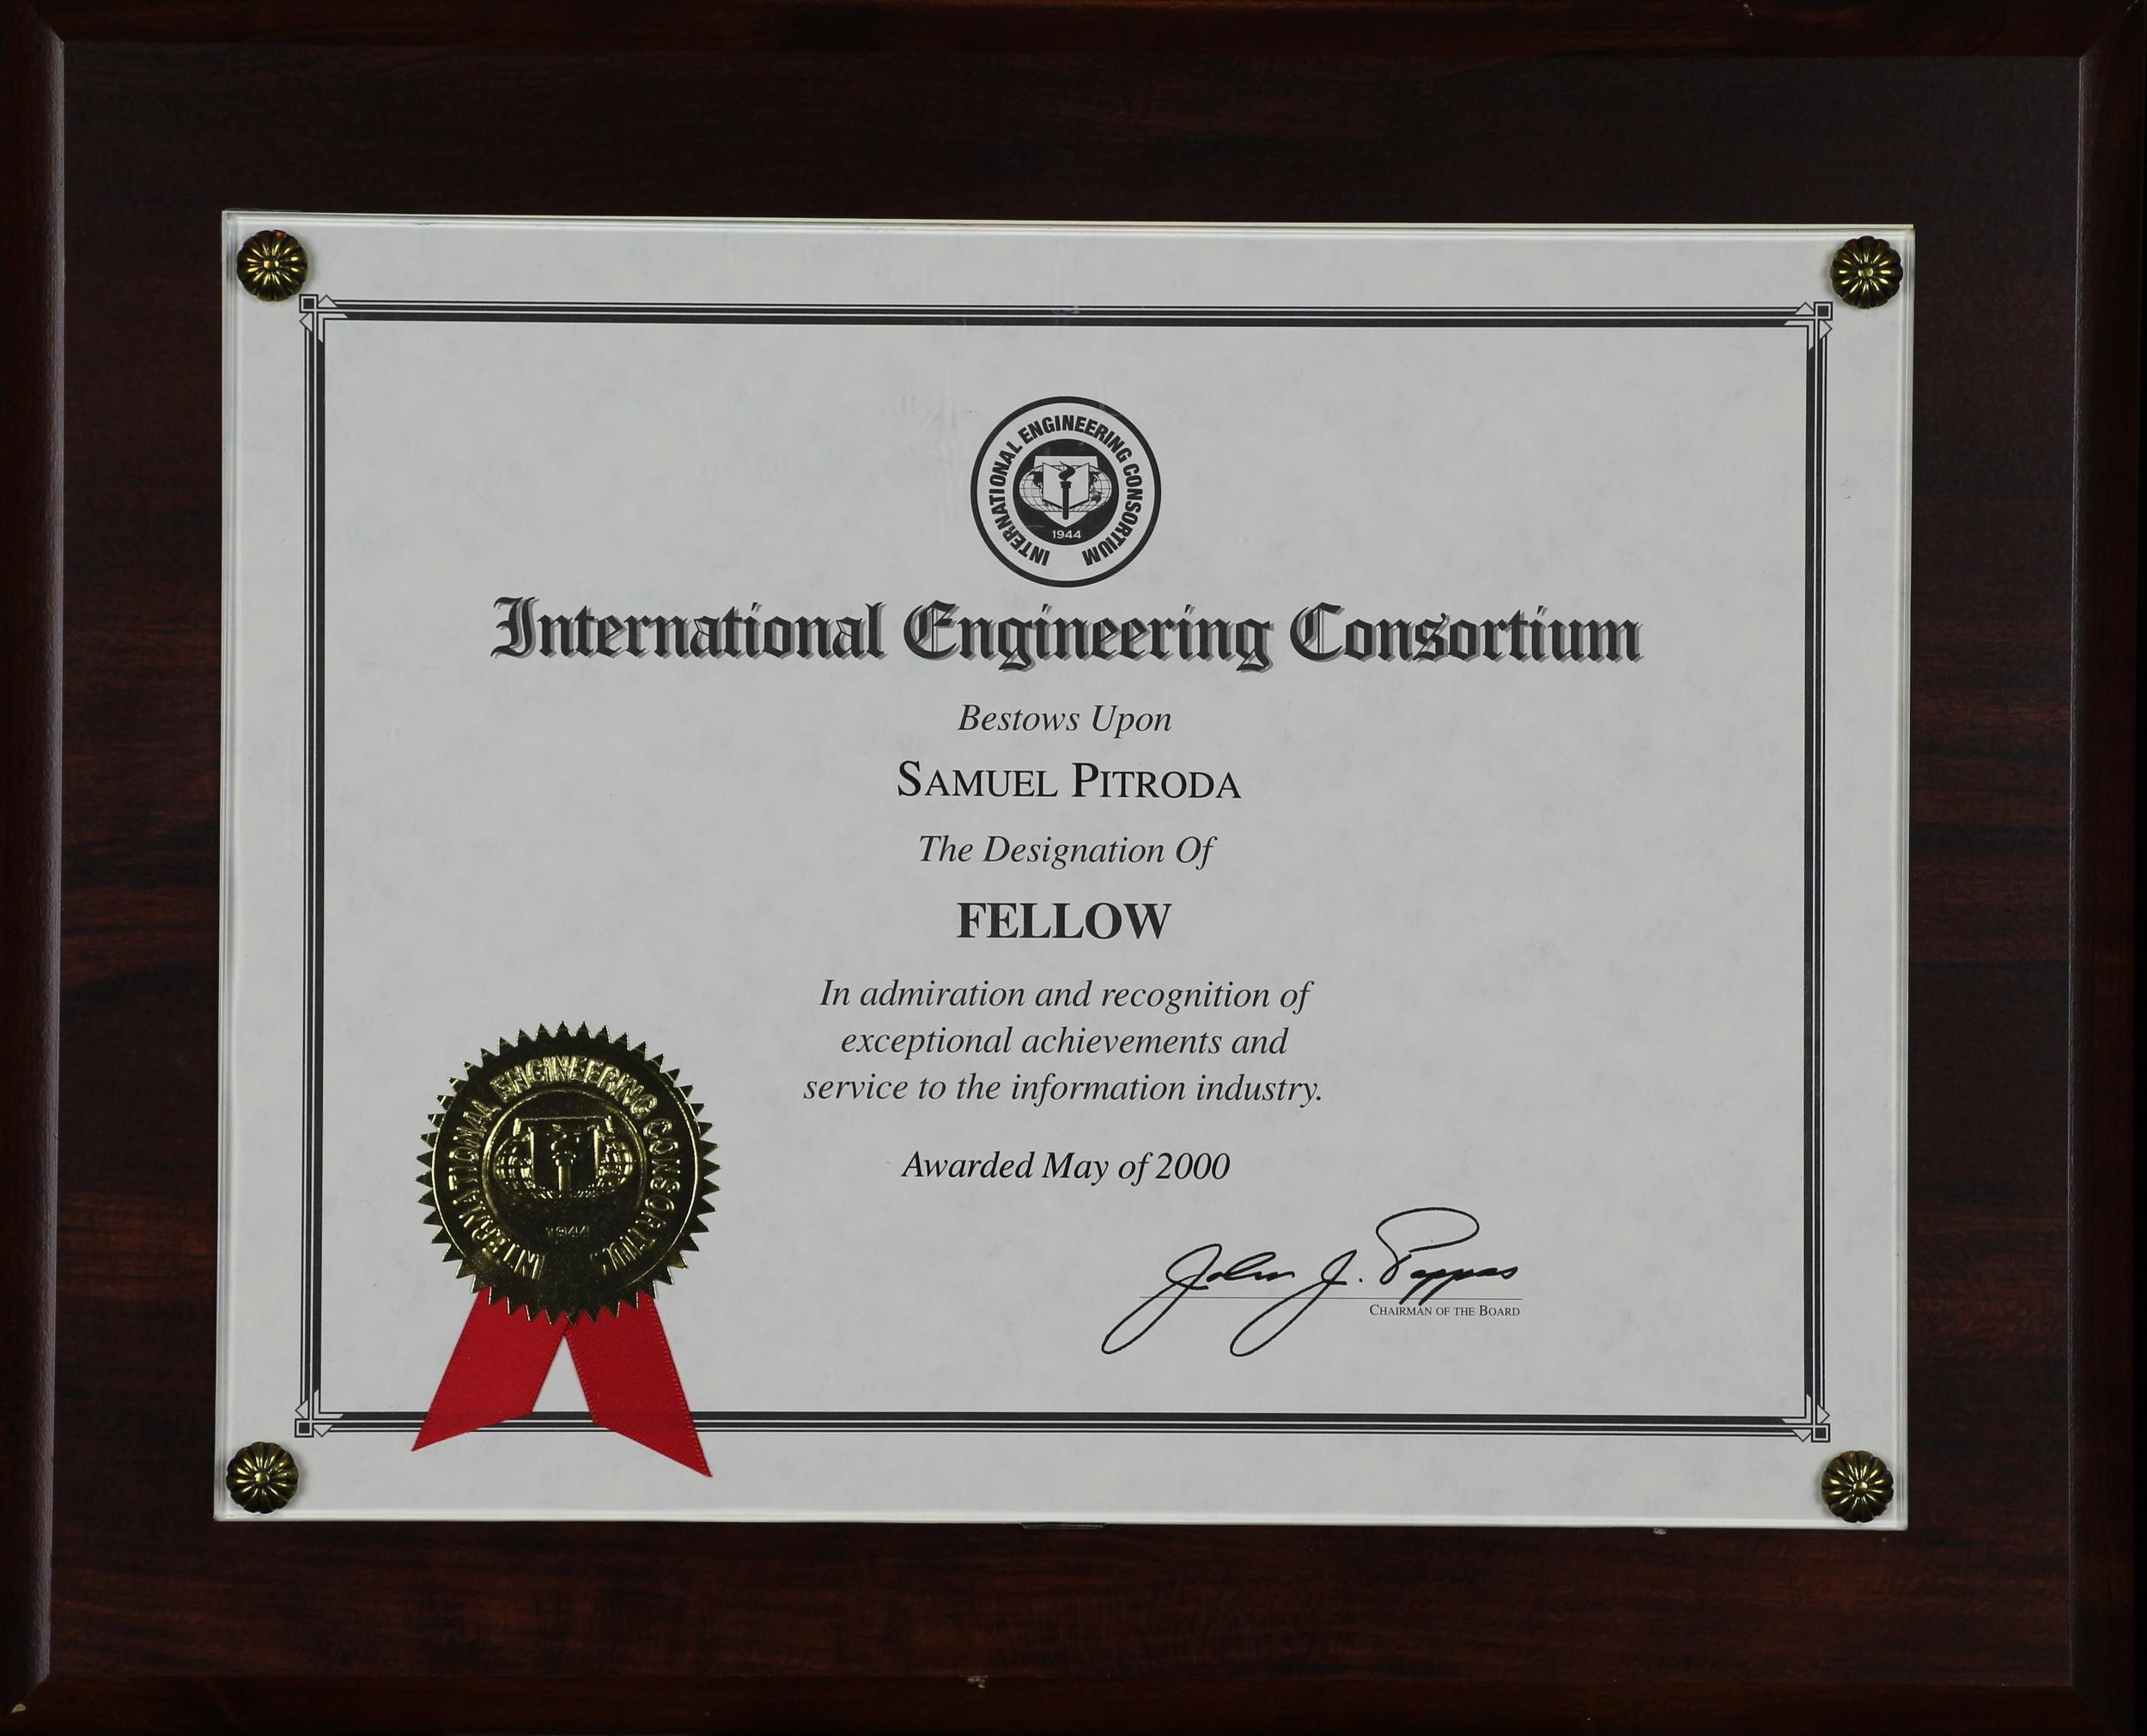 Fellowship Award, International Engineering Consortium, 2000